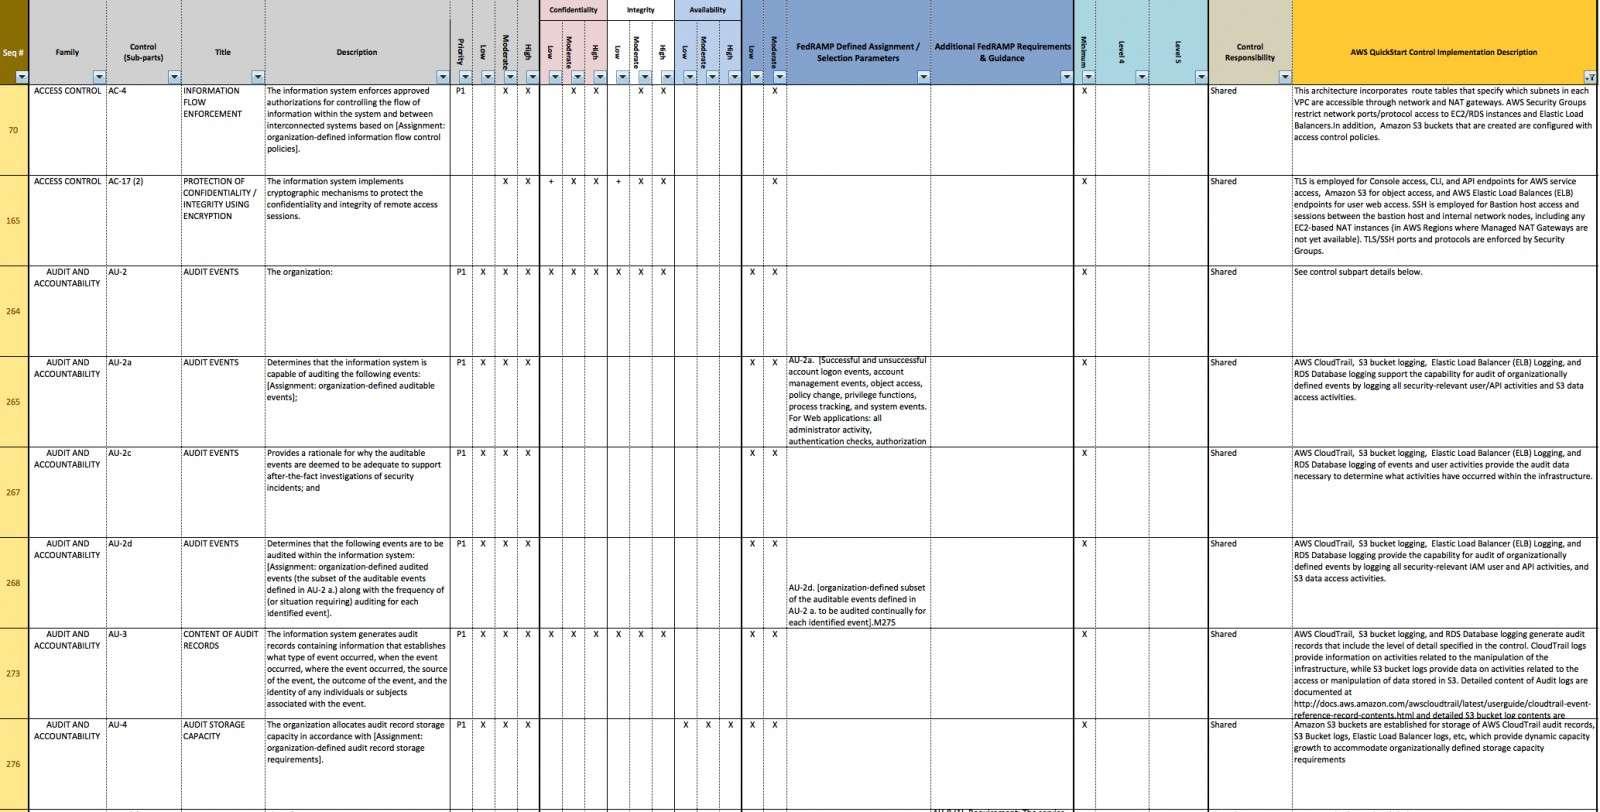 Nist 800 53 Rev 4 Excel Spreadsheet Intended For Nist Sp 800 53 Rev 4 Spreadsheet  Readleaf Document